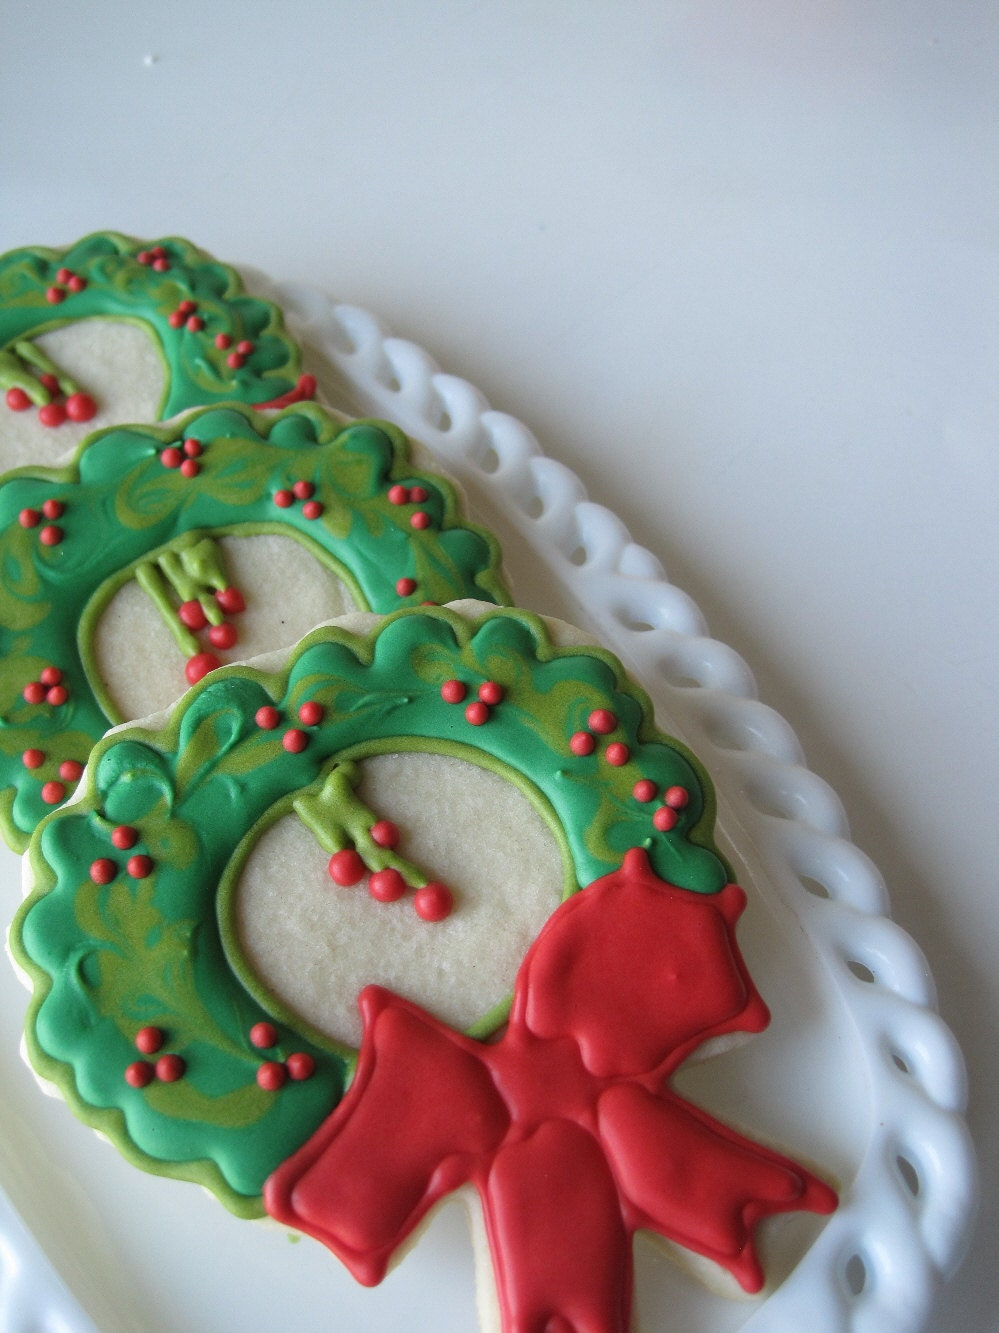 Holiday WREATH sugar cookies - 1 dozen